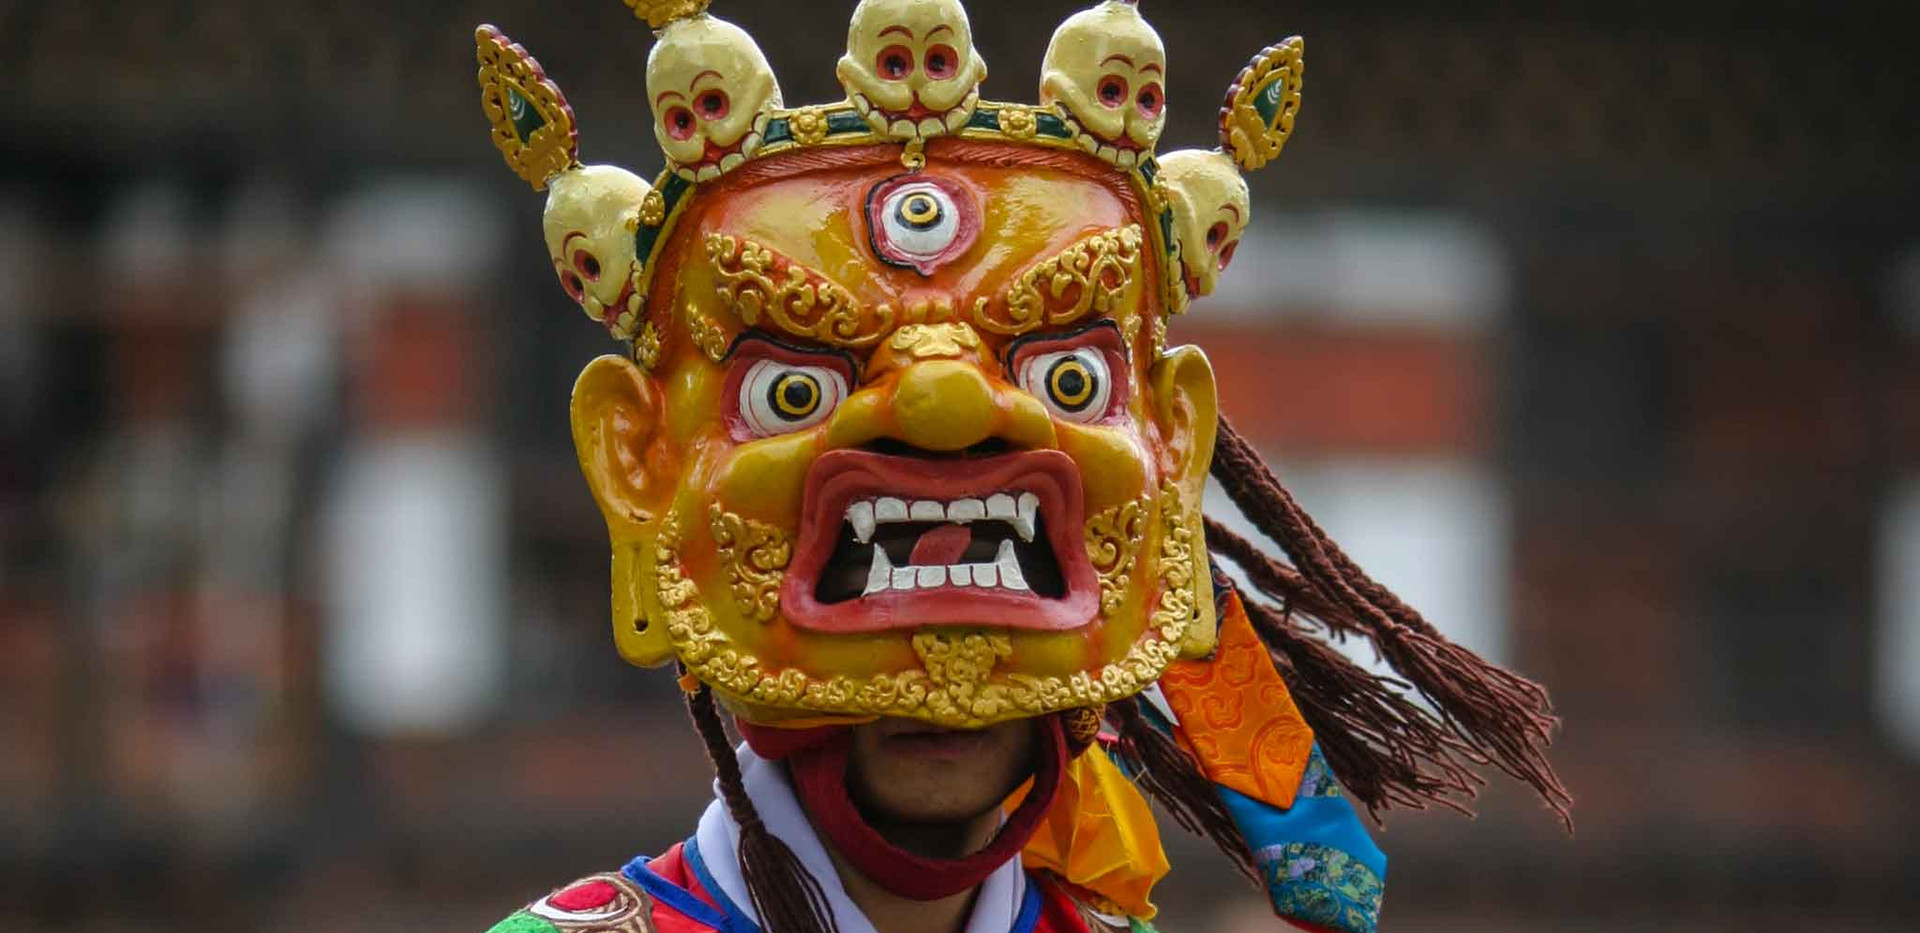 mask-dancer-bhutan.jpg